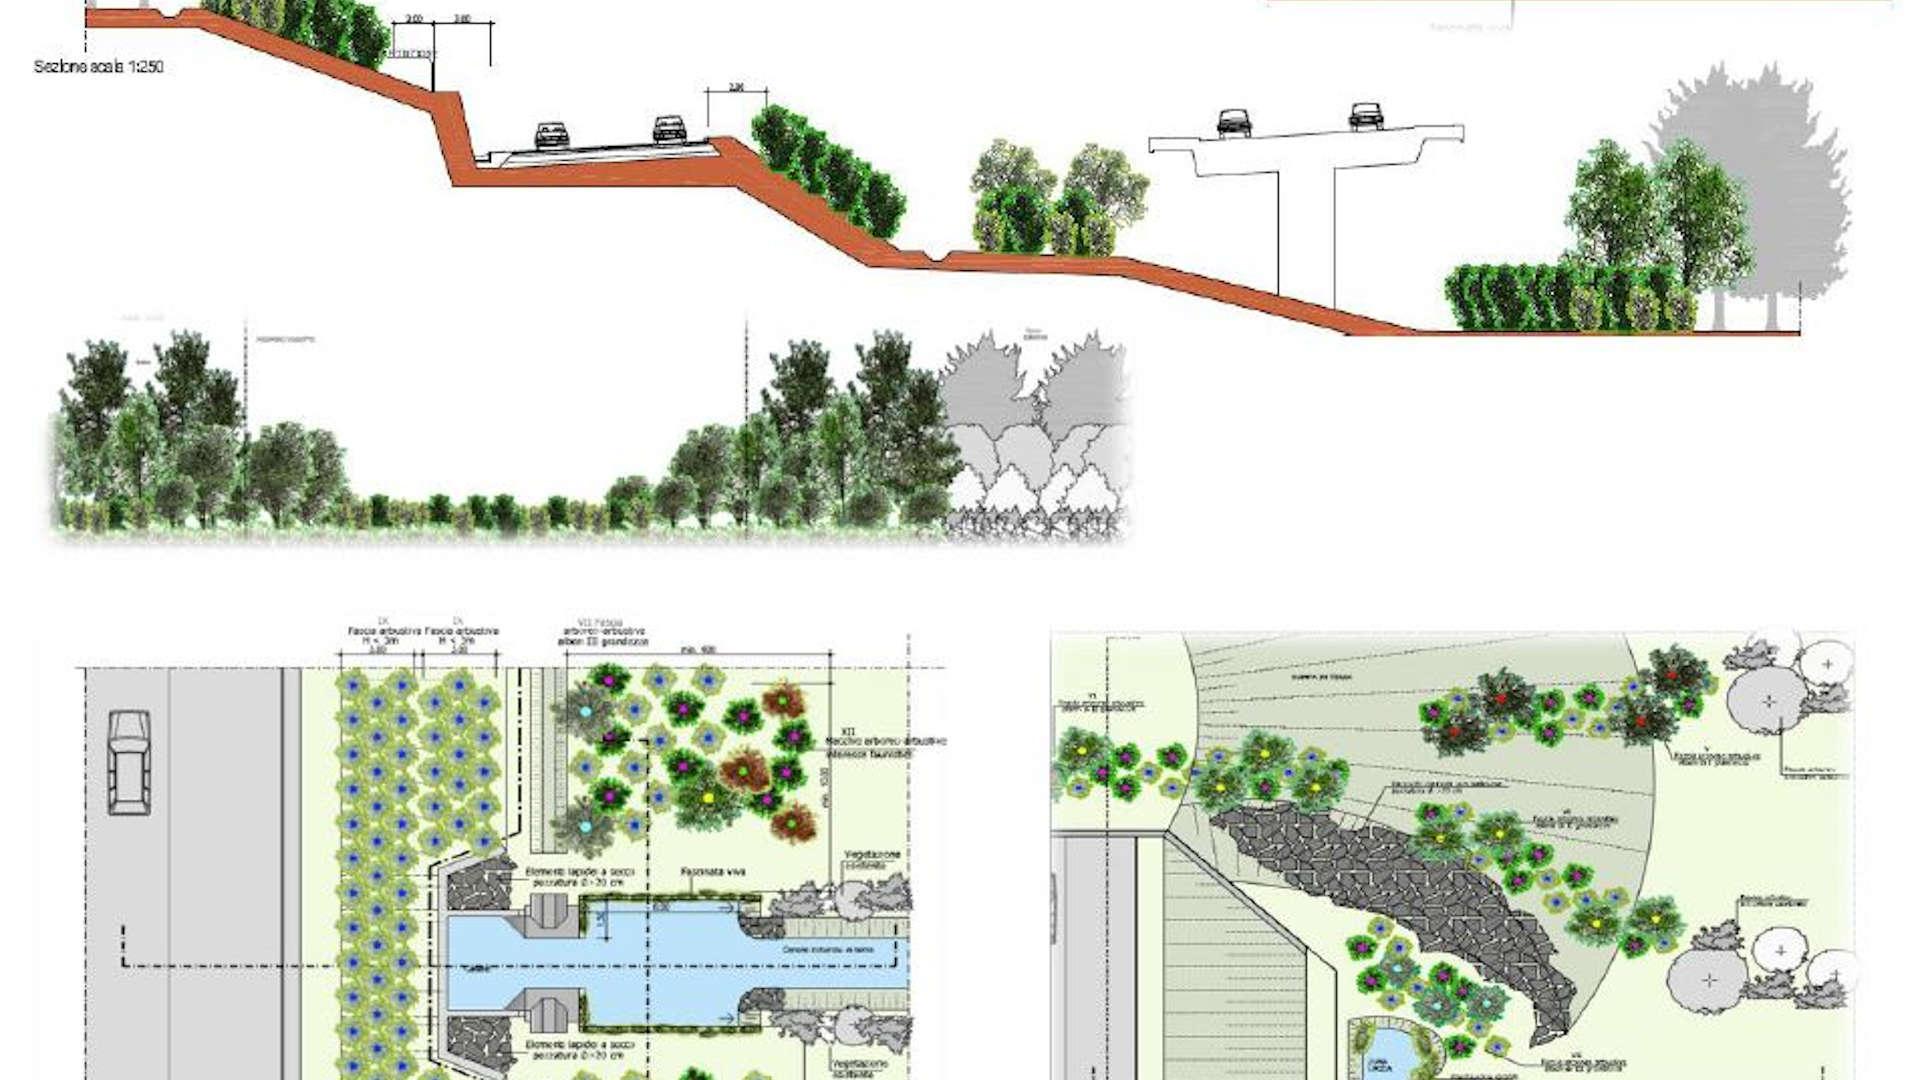 Varese Como Dalmine Collegamento Autostradale Main E-Farm Studio Ingegneria Padova